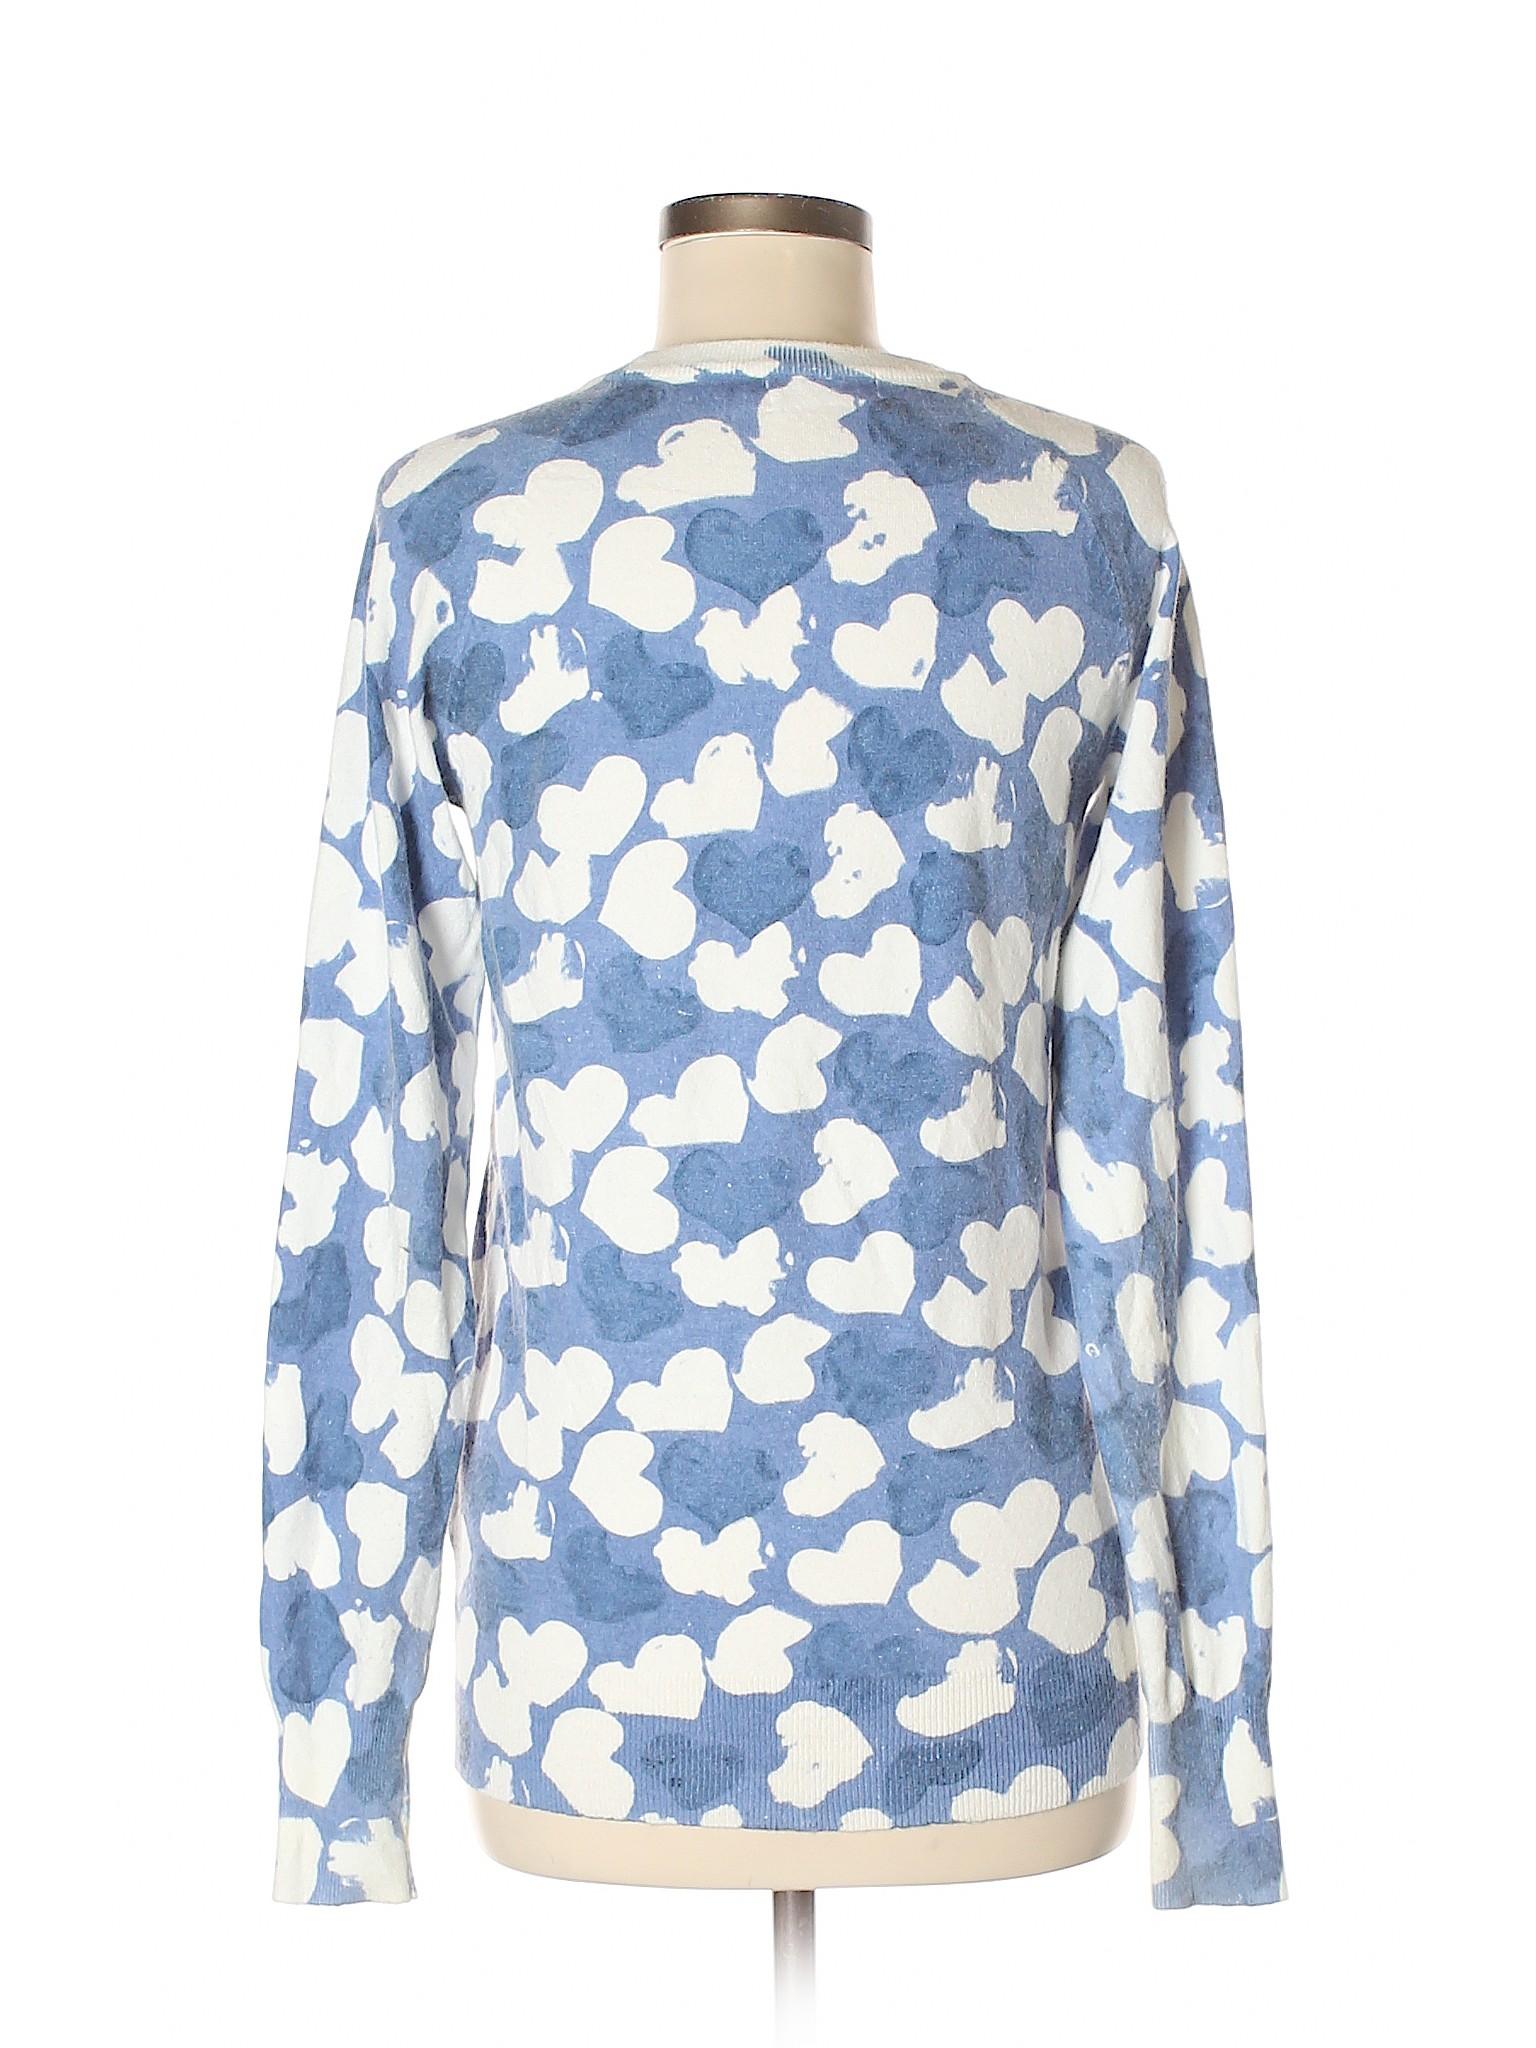 Boutique Pullover Pullover Boutique Sweater Sweater XIA XIA 6q6rUHF